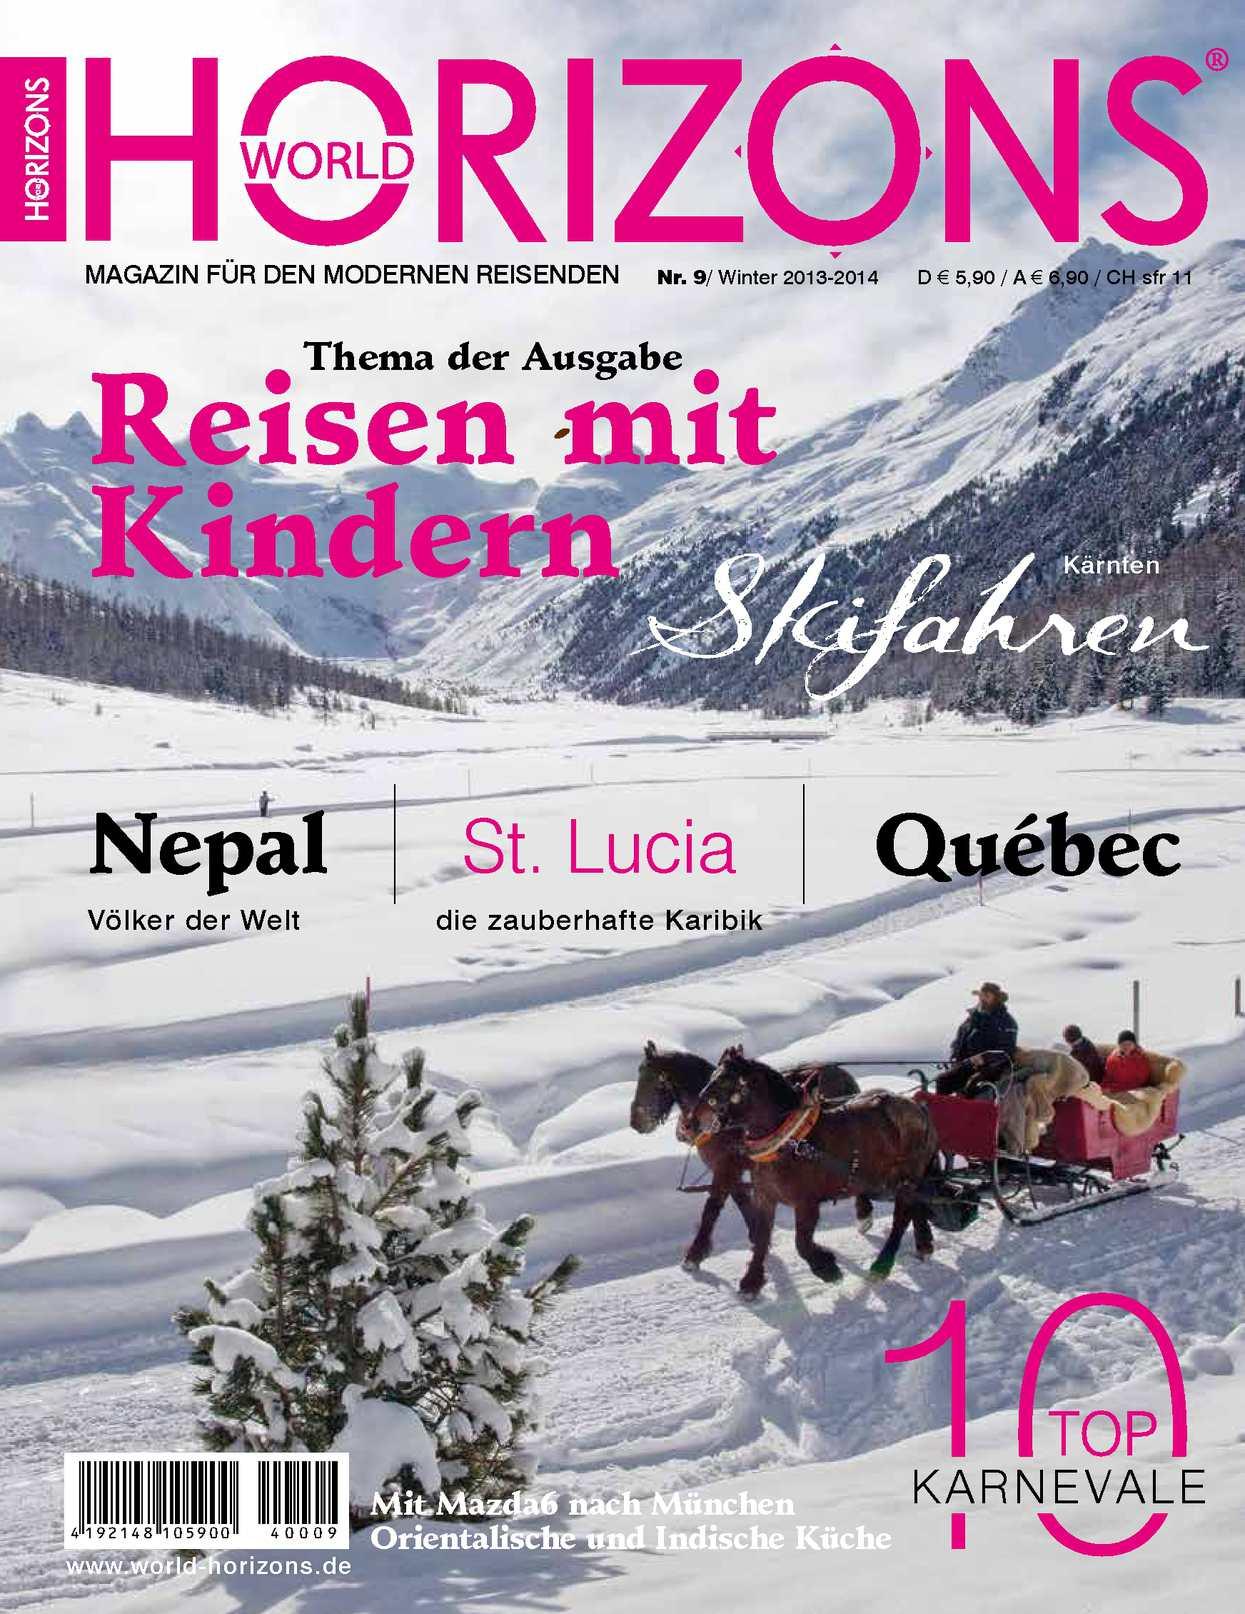 World Horizons Nummer 9 - Winter 2013/2014